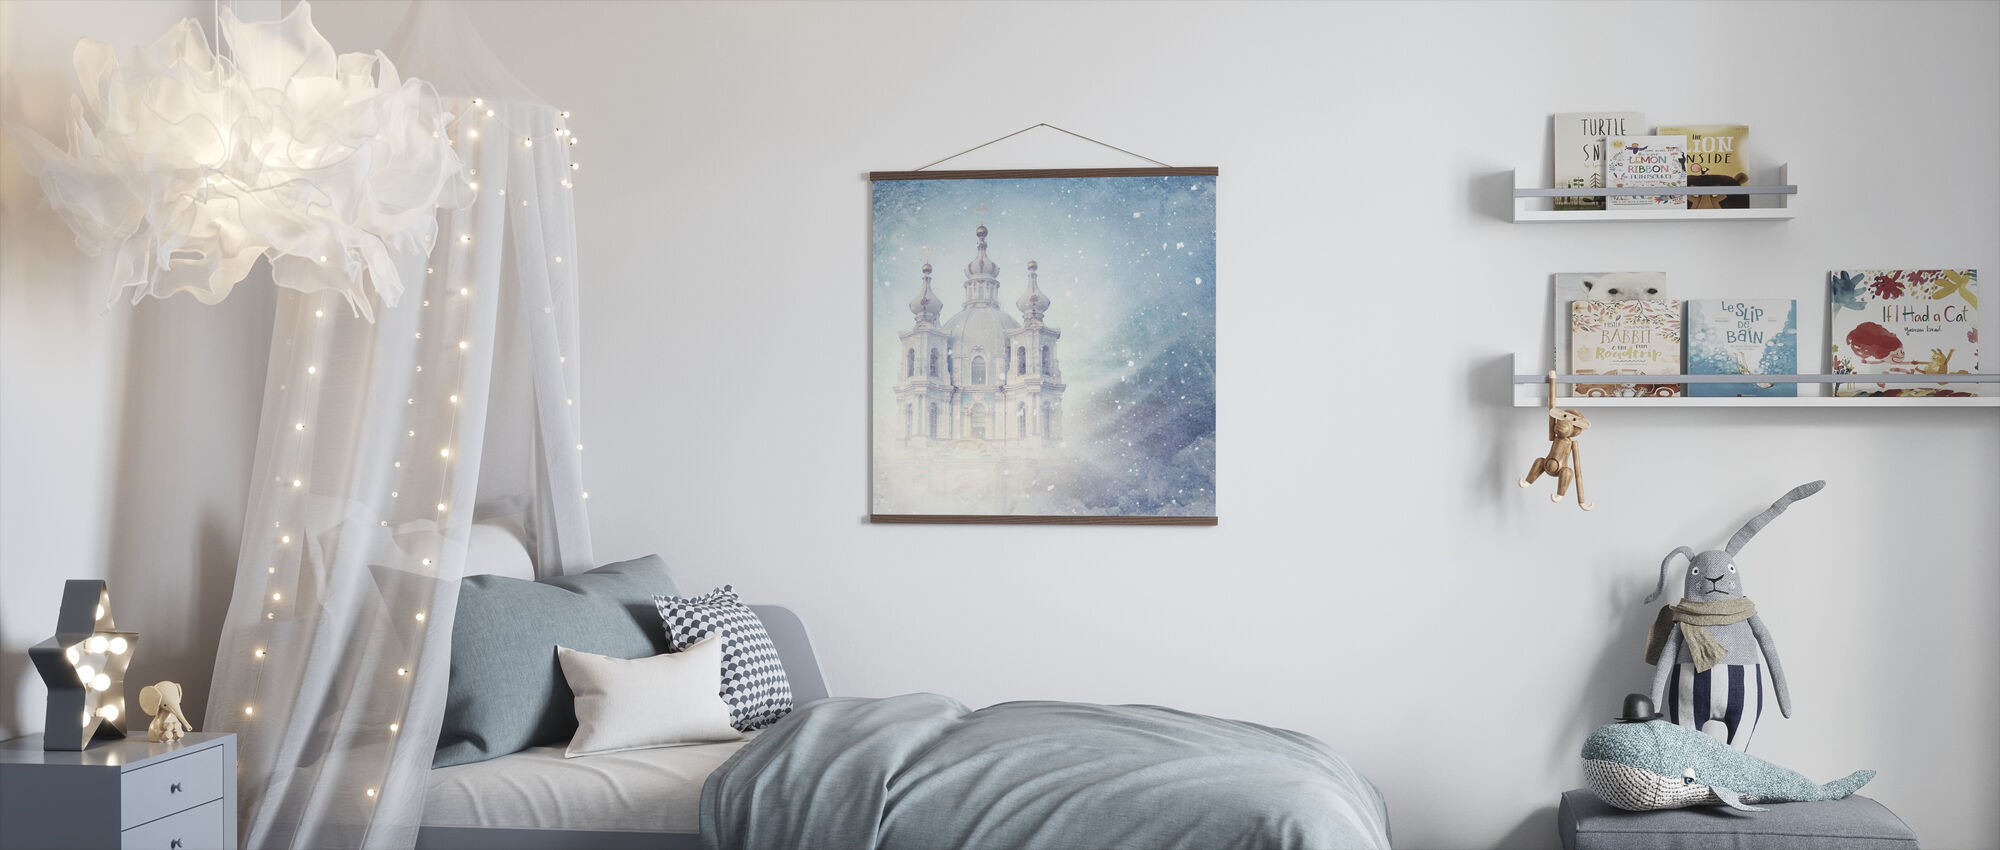 Dream slott - Plakat - Barnerom